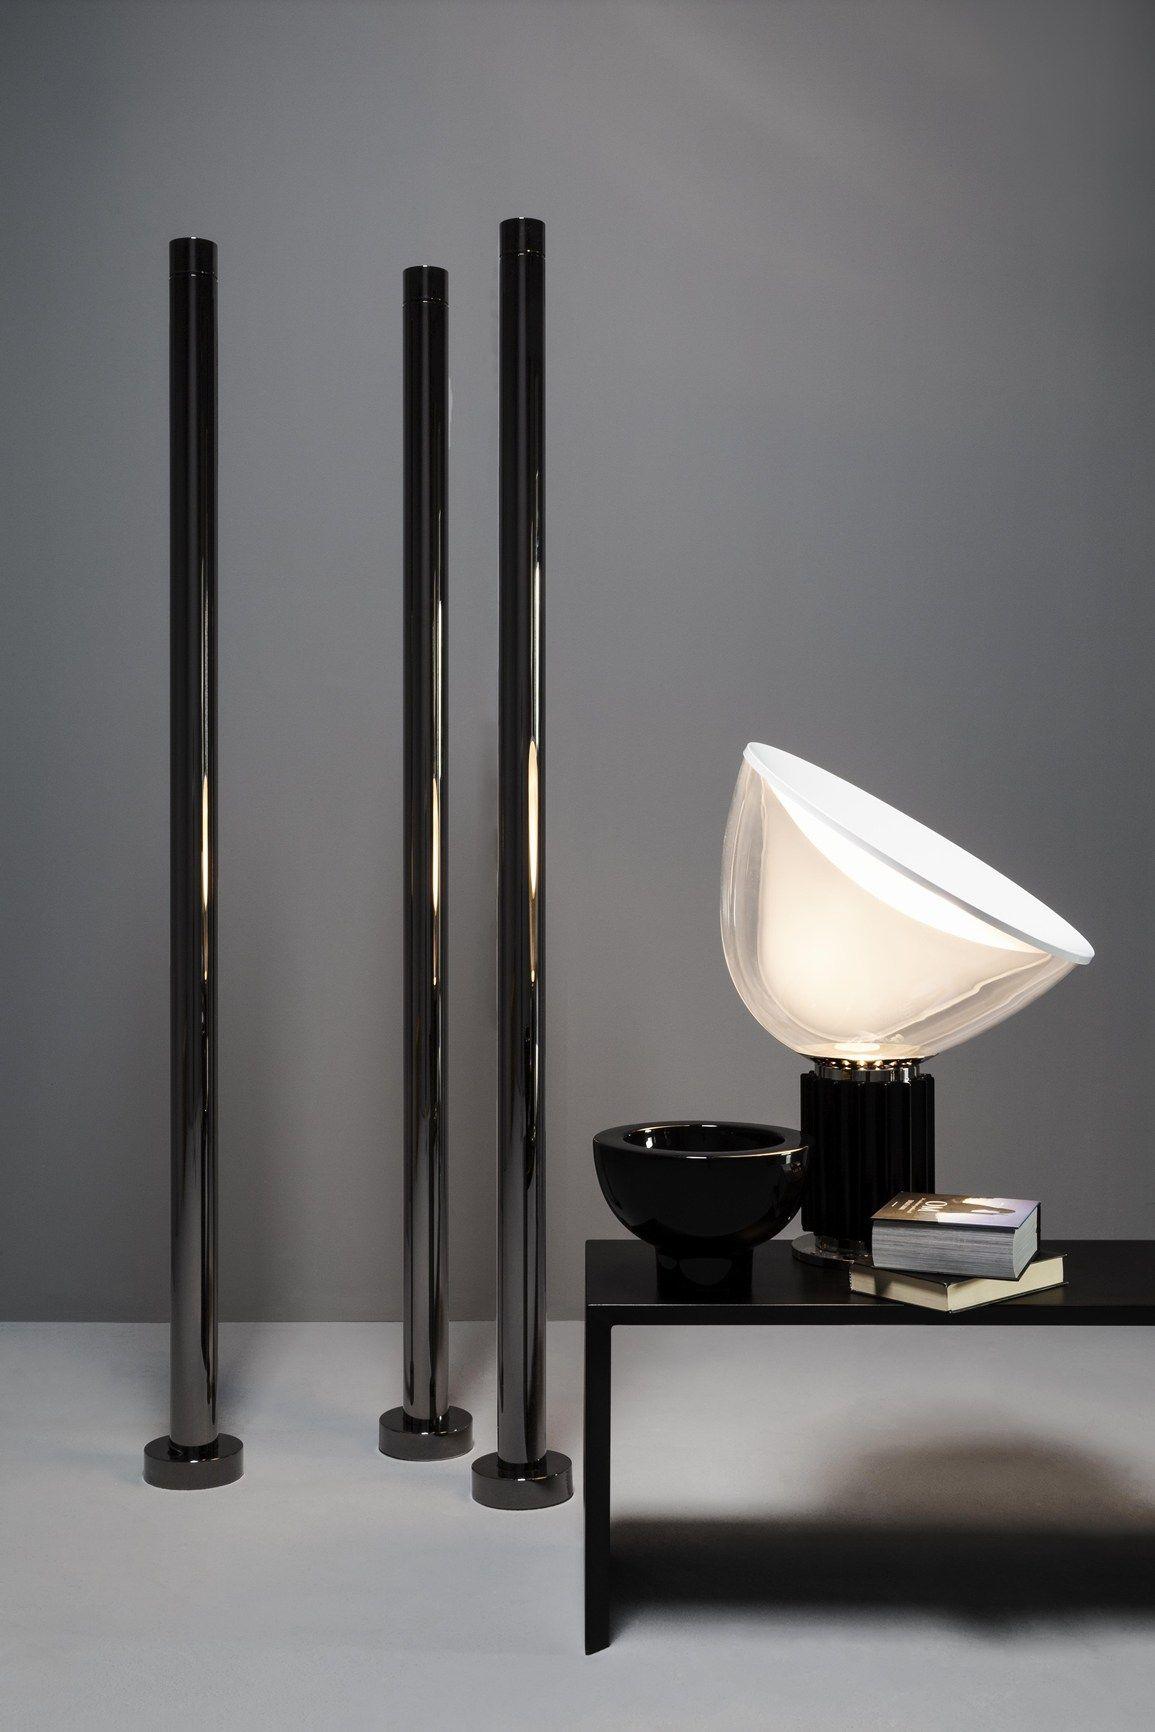 Tubes, t.b.t. design Ludovica+Roberto Palomba